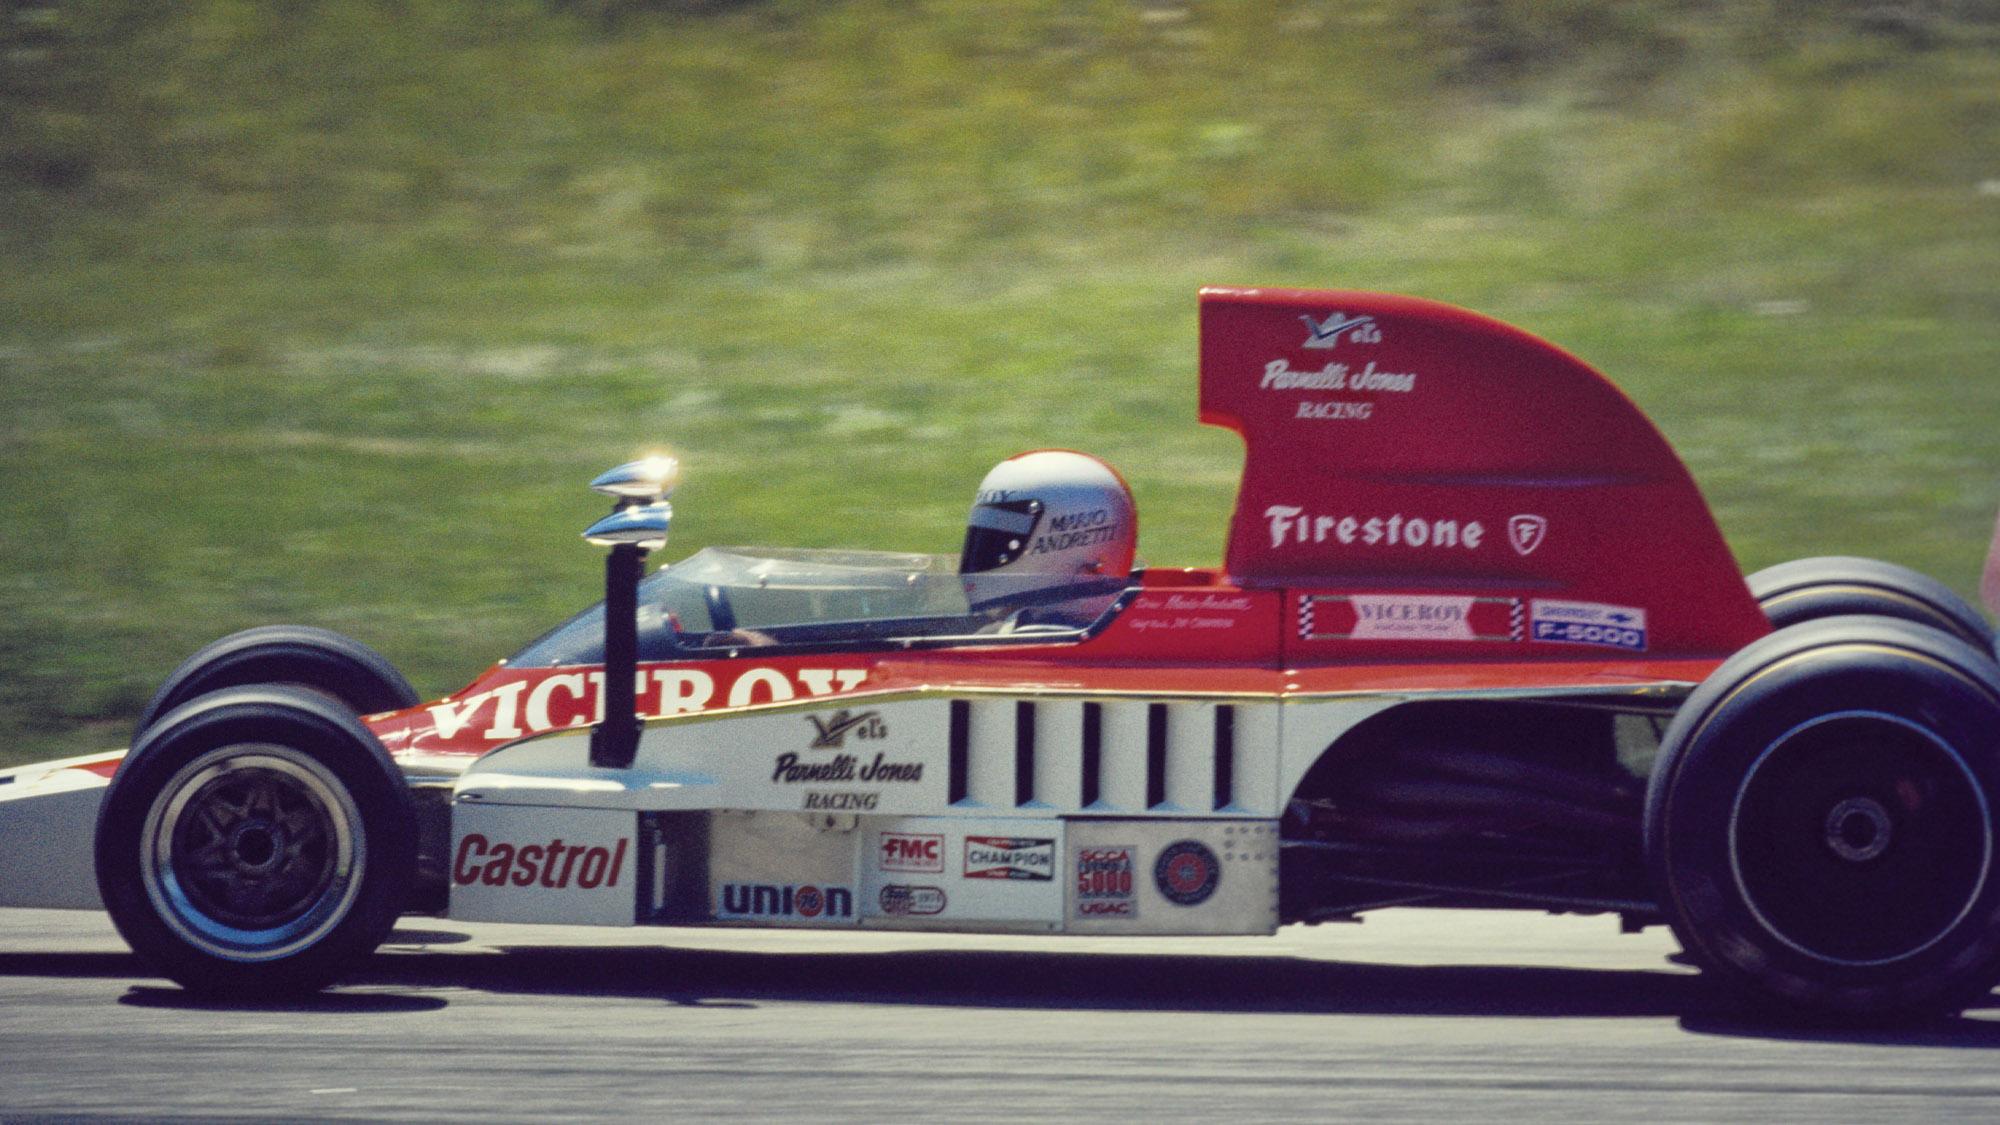 Mario Andretti in Parnelli Jones Racing F5000 car in 1975